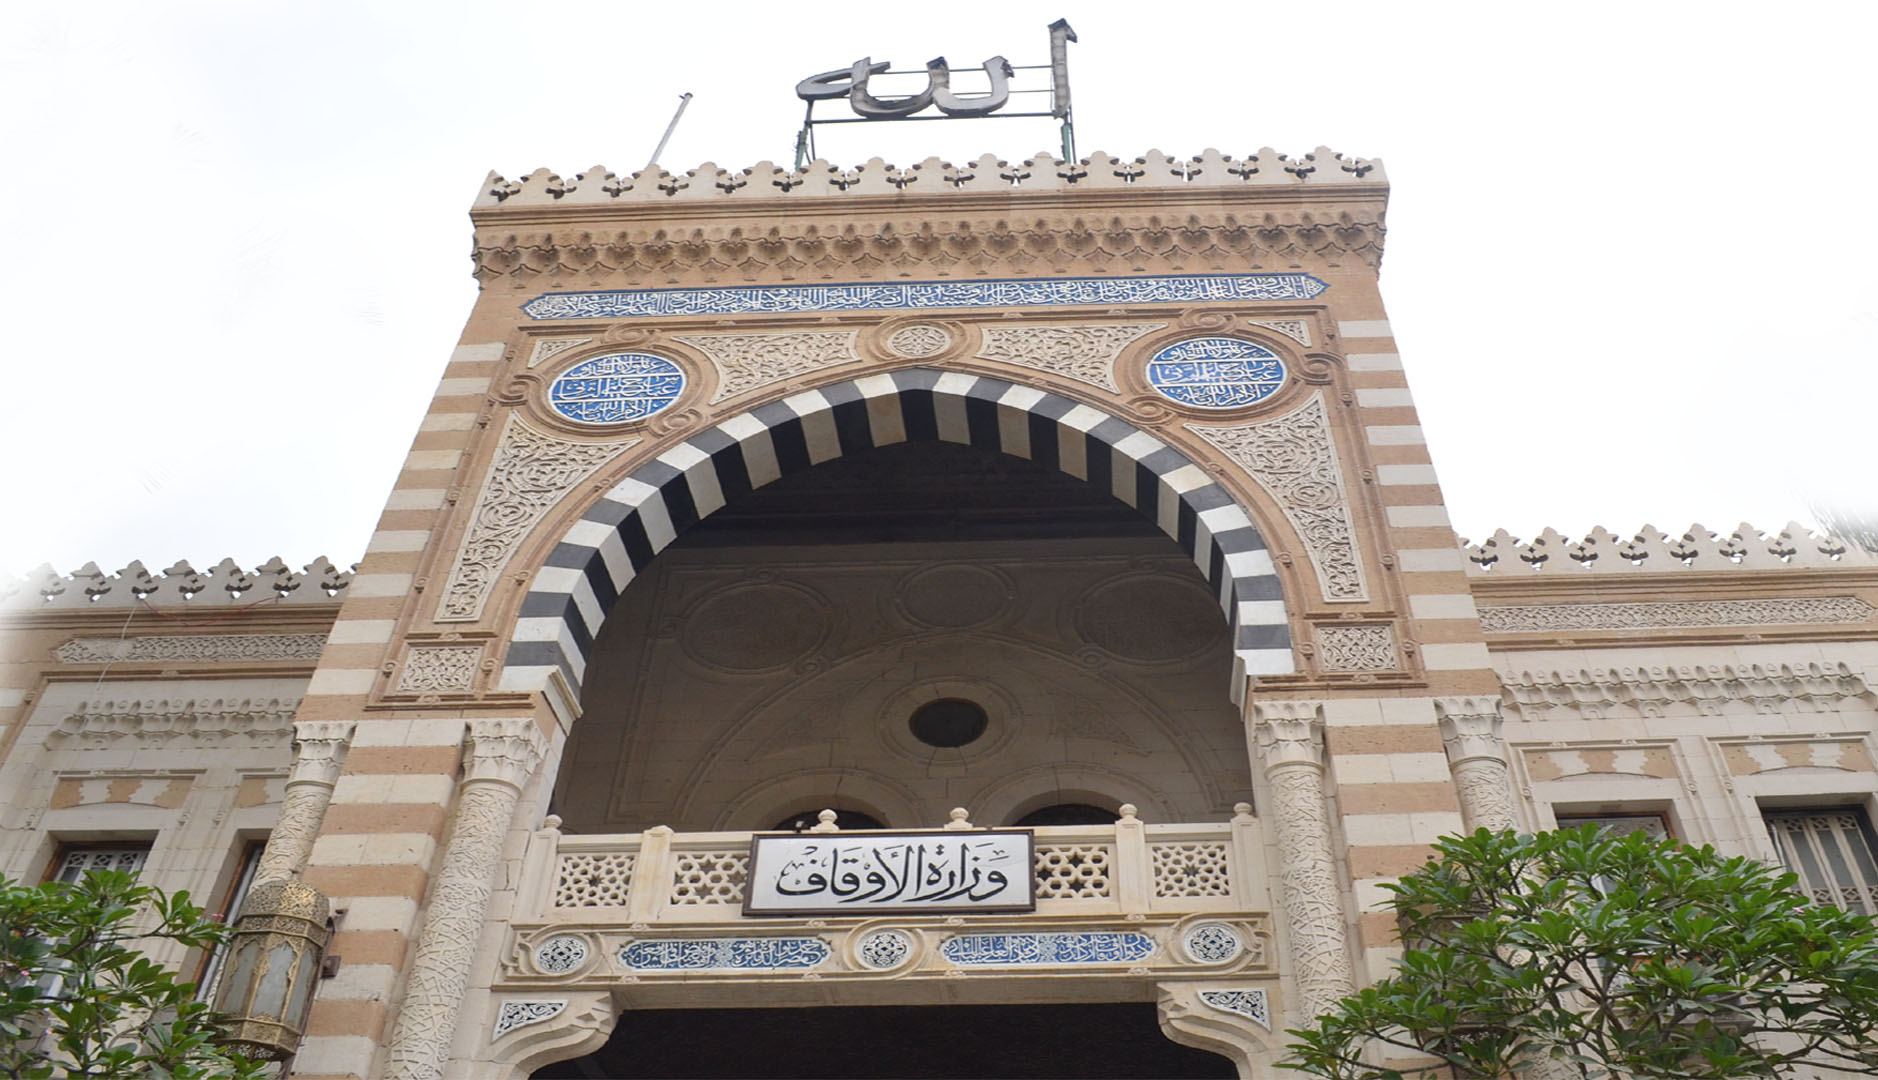 Photo of  من صحافة اليوم الثلاثاء  الموافق 7 / 4 / 2020م